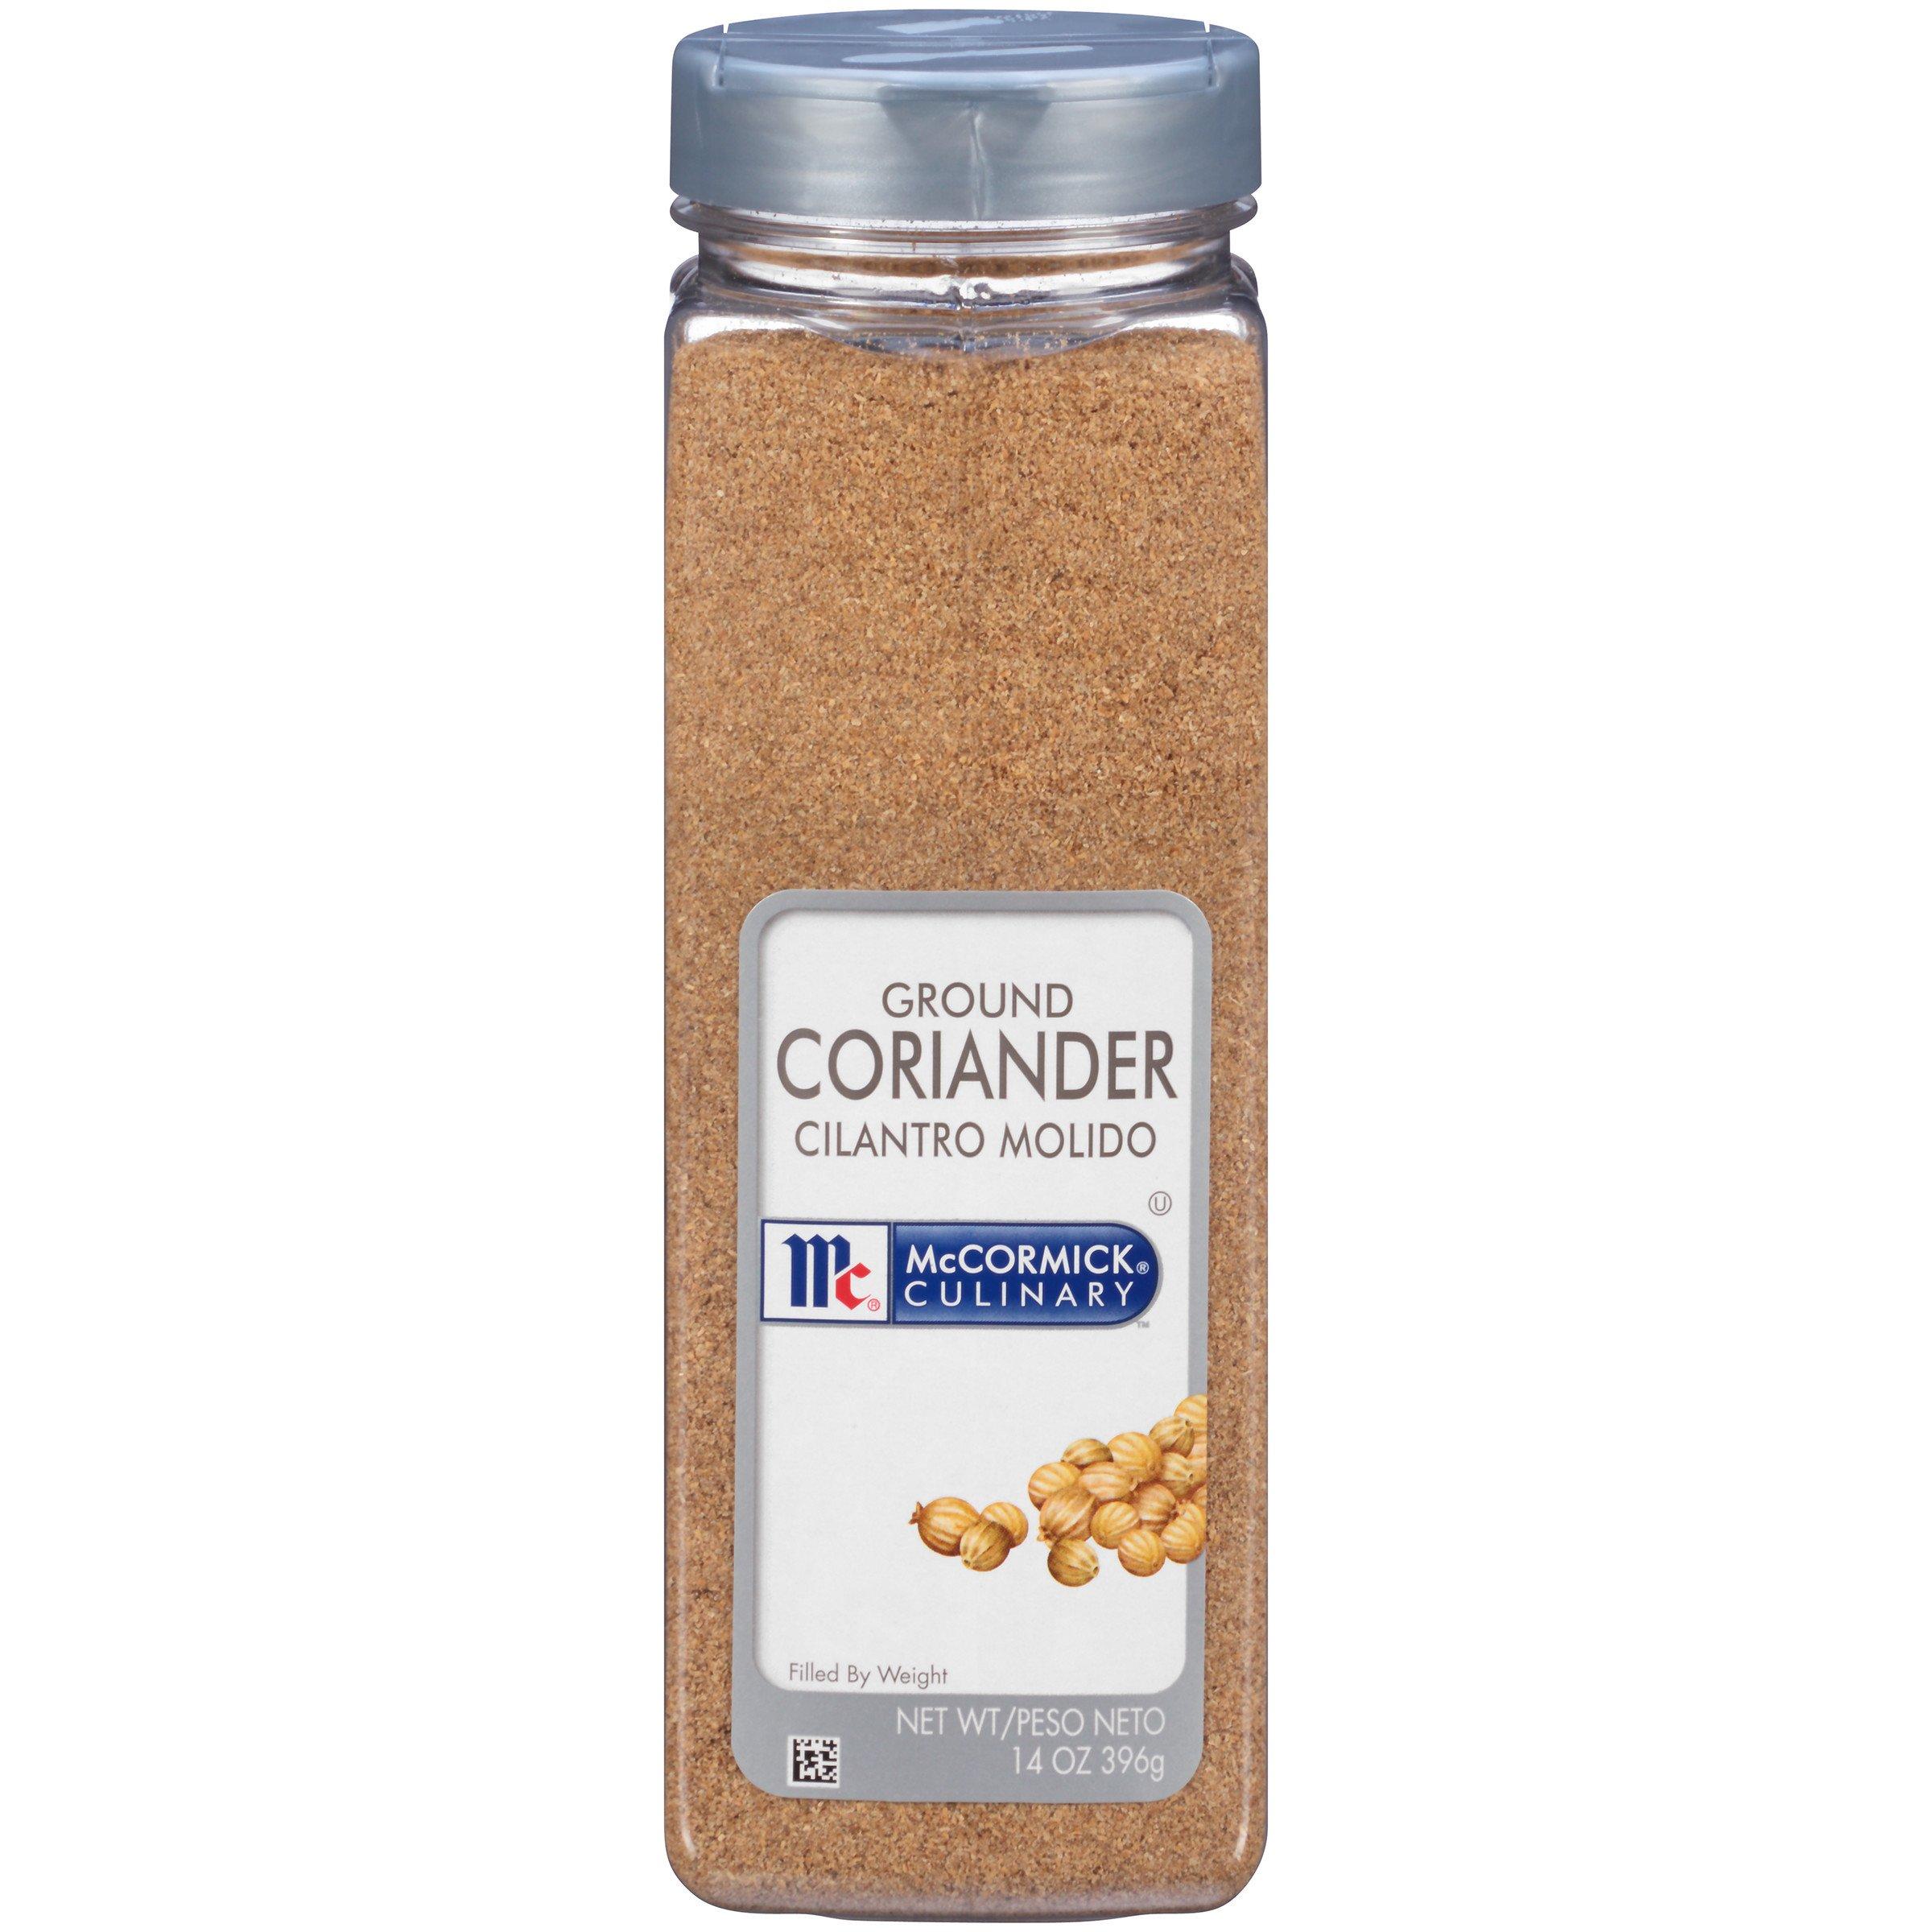 McCormick Culinary Ground Coriander, 14 oz